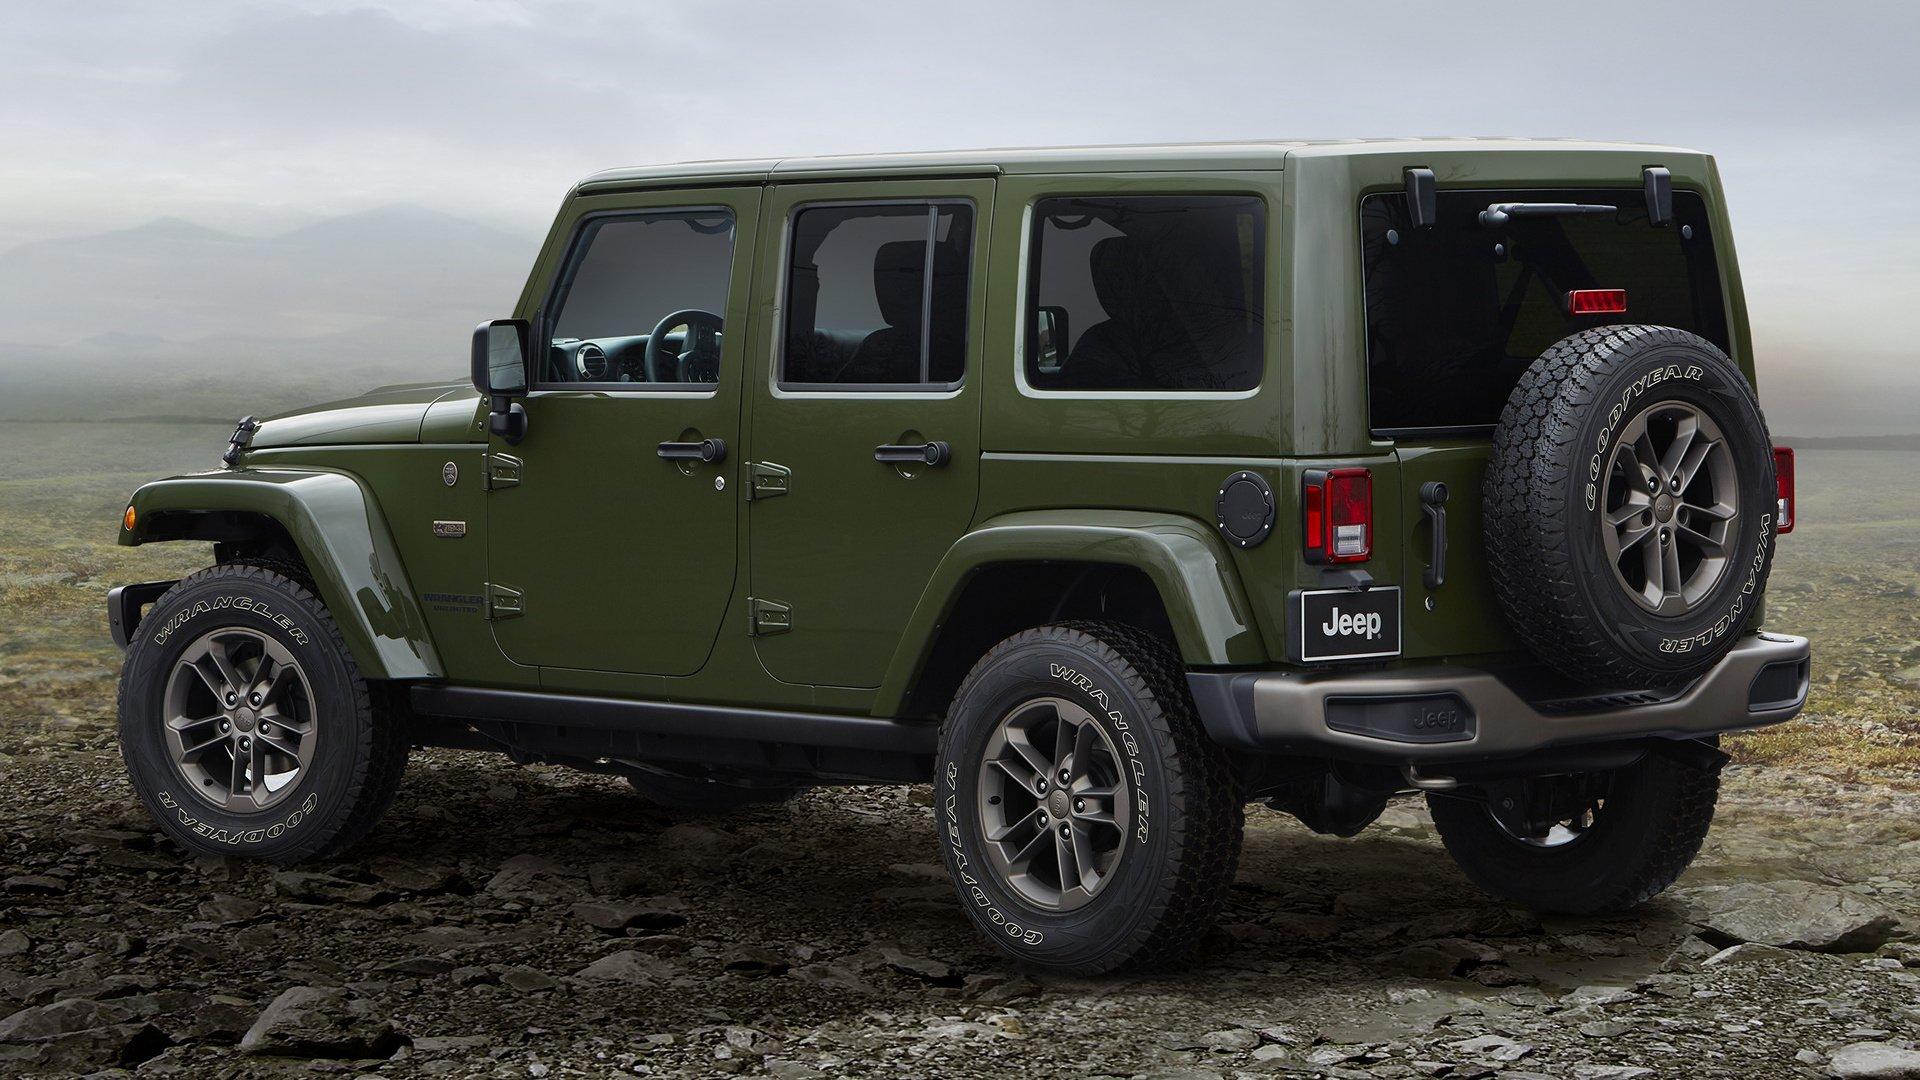 2016 Jeep Wrangler Unlimited 75th Anniversary Fond d'écran ...